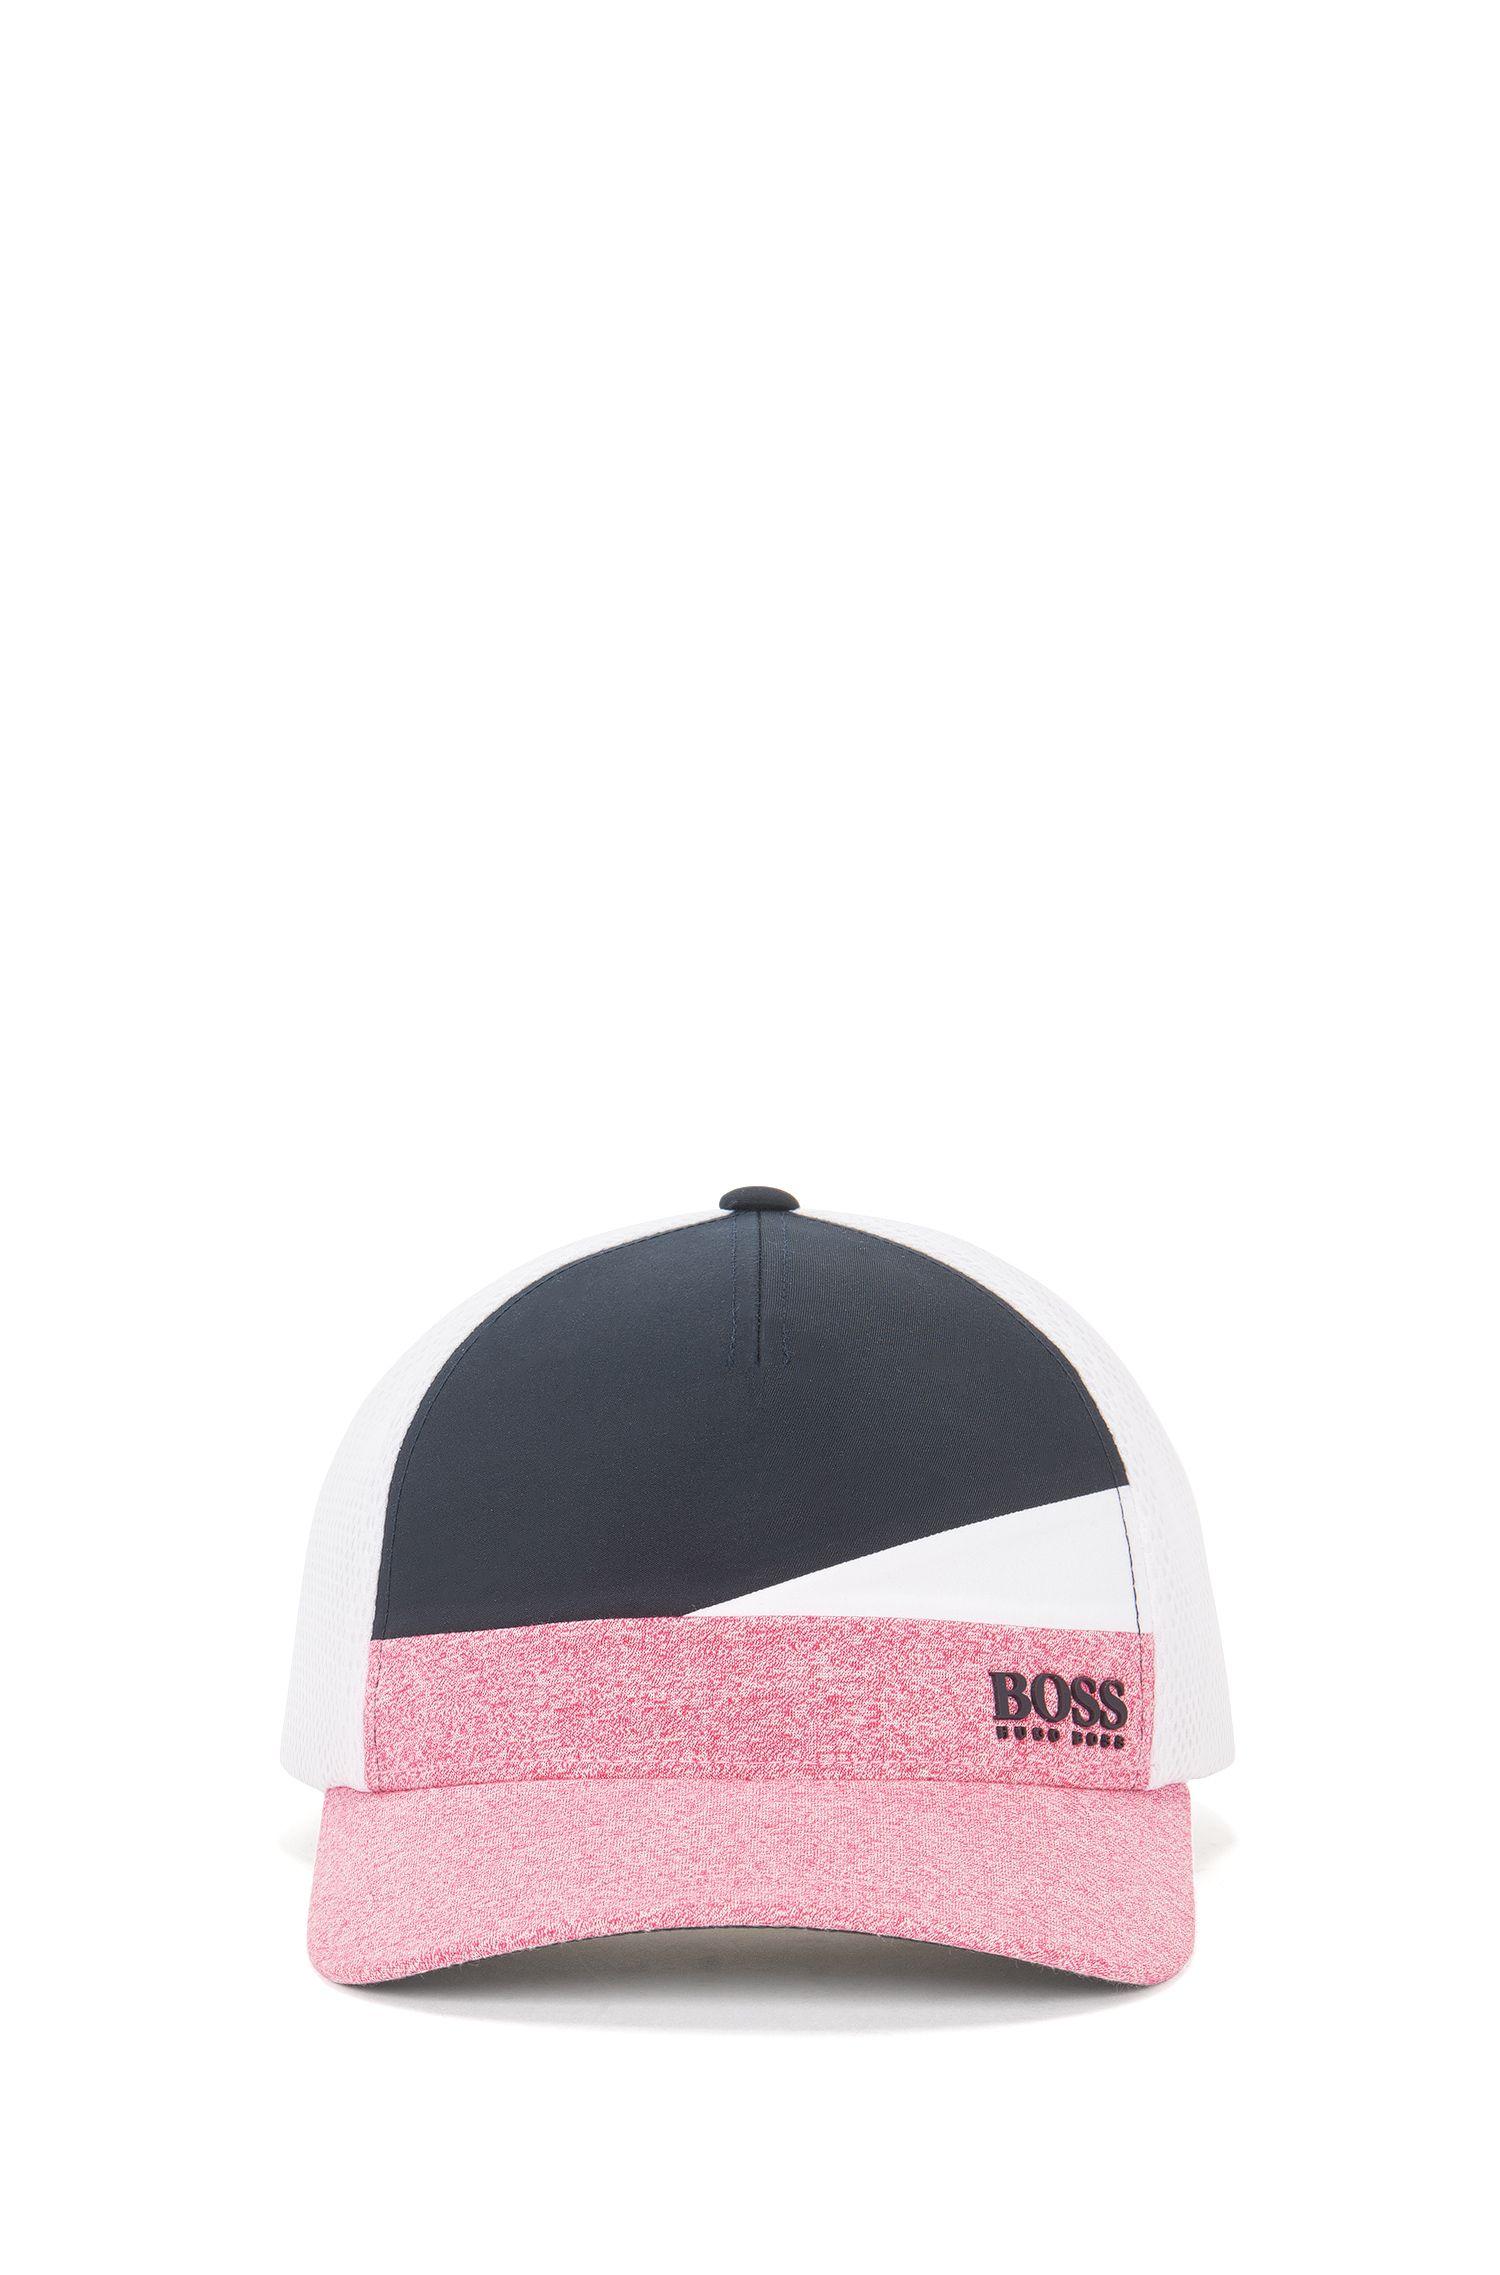 Woven Baseball Cap | Printcap